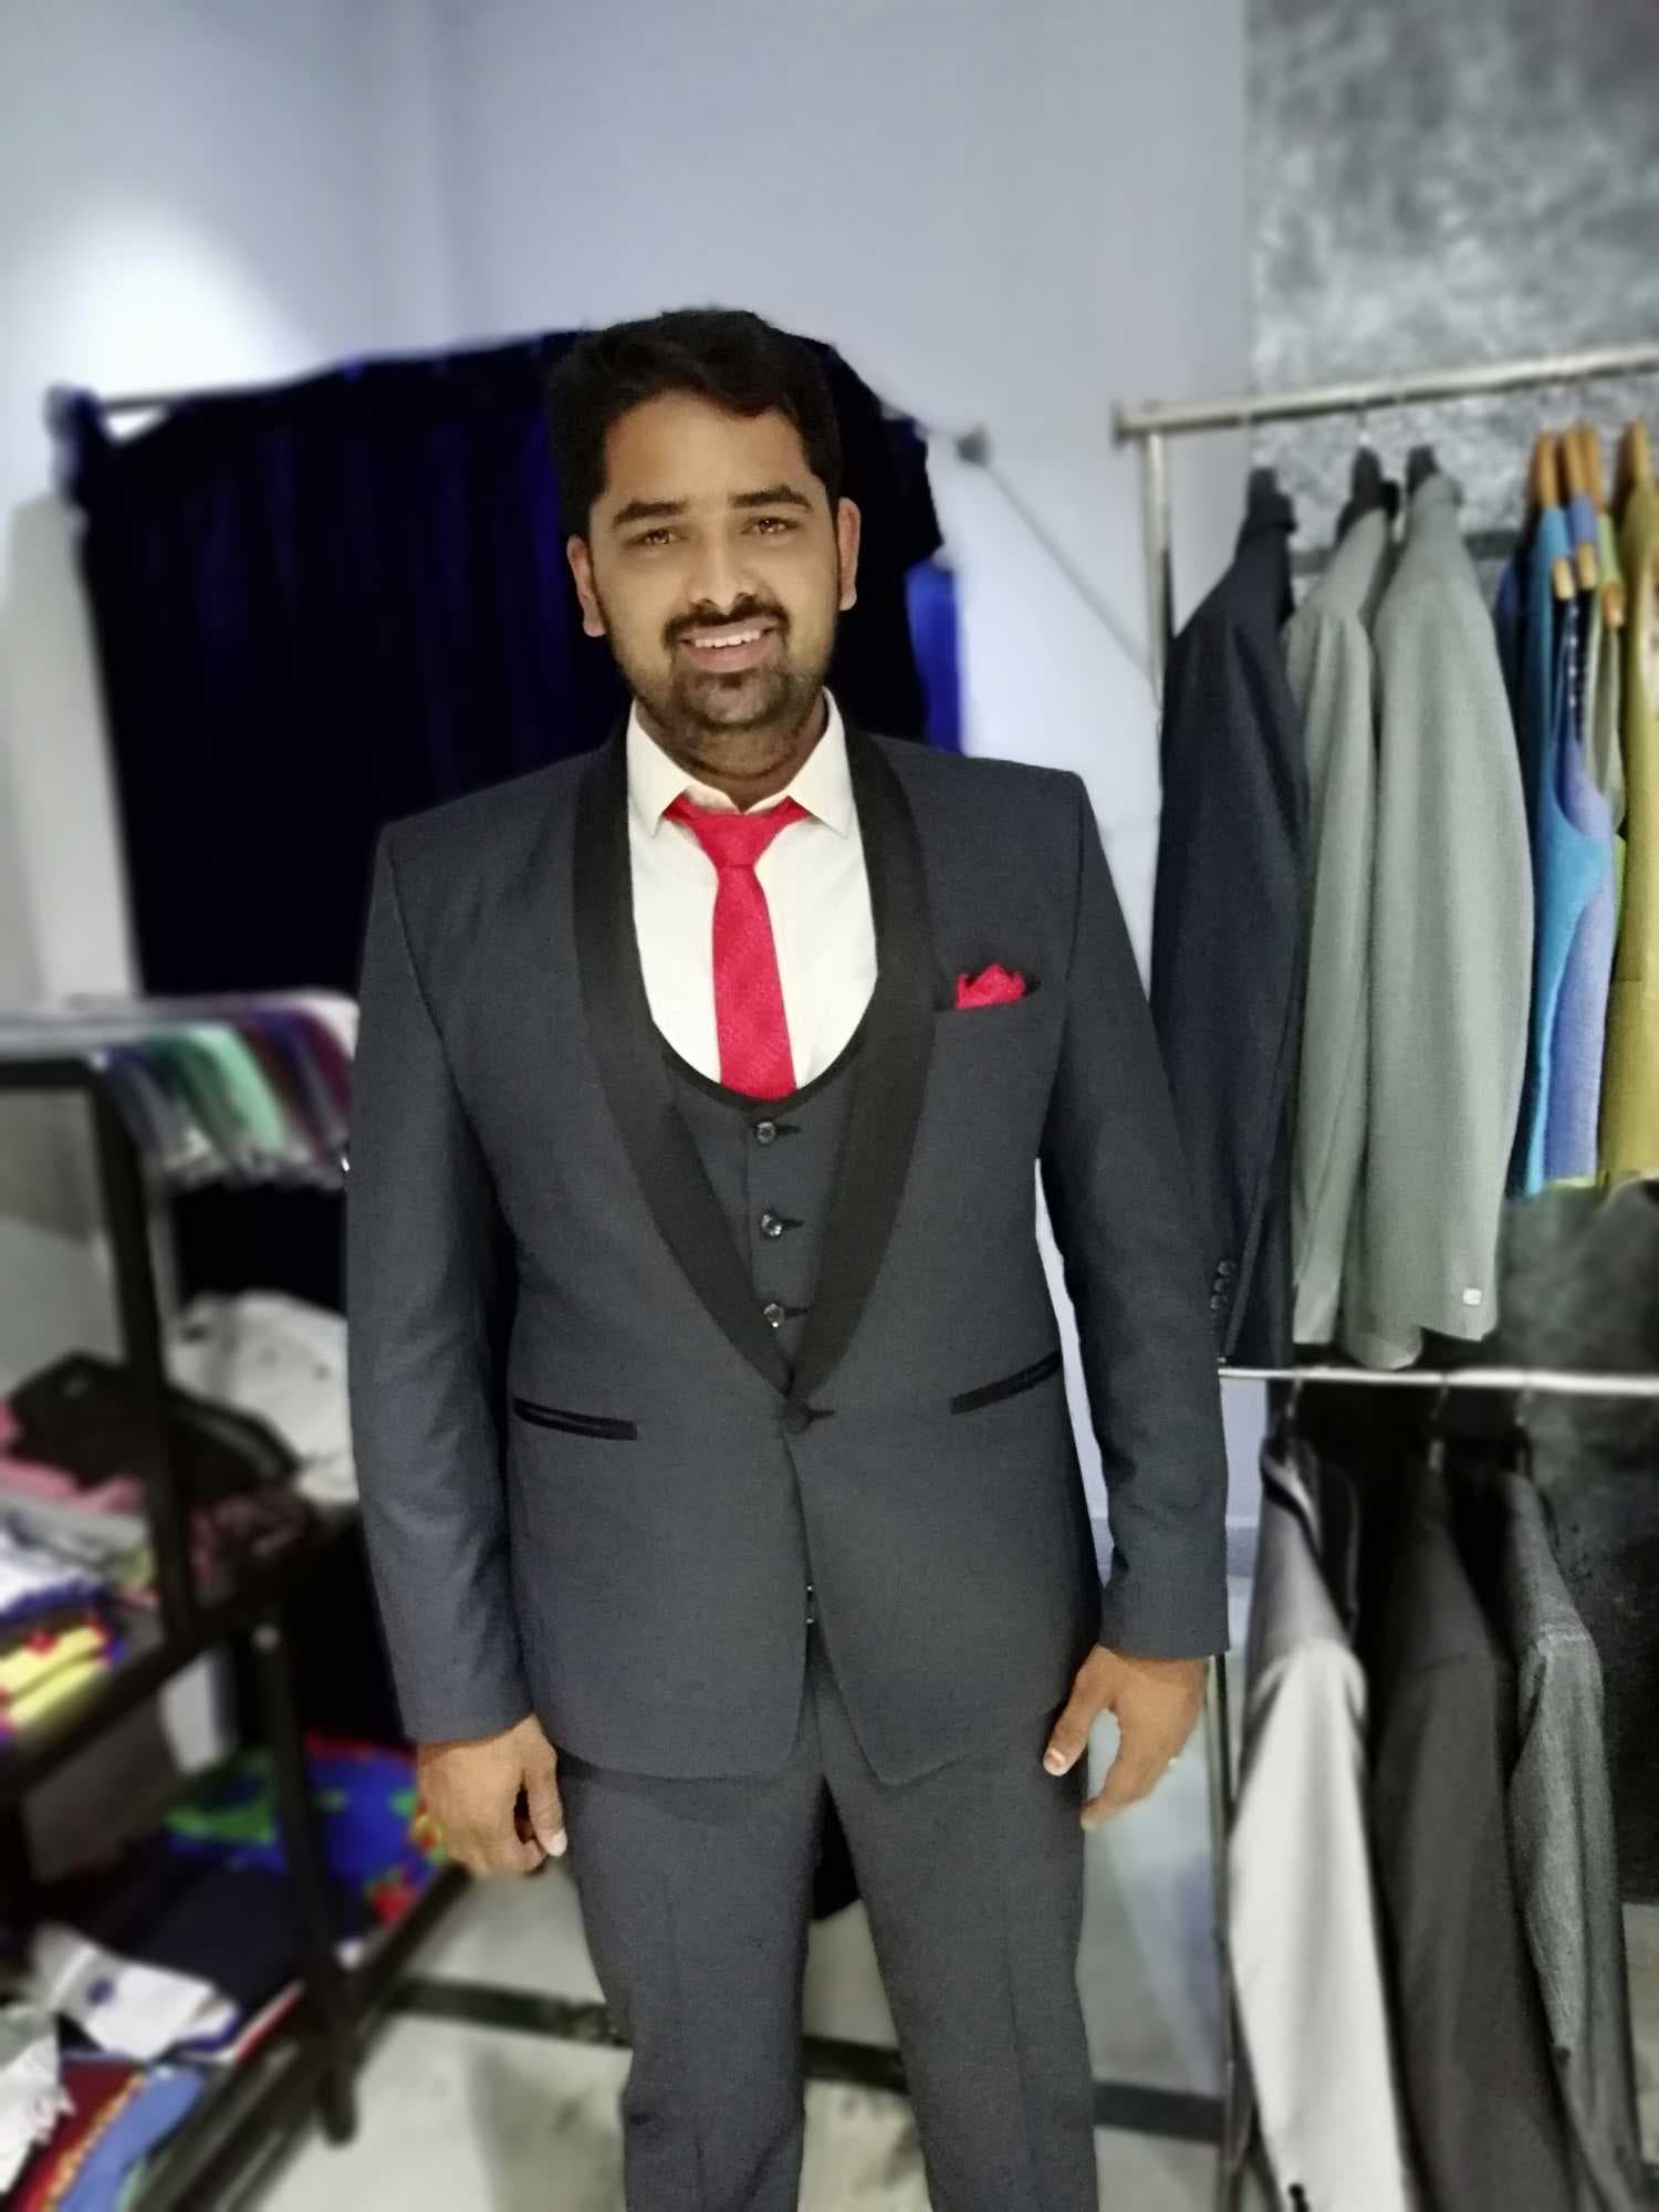 Top 50 Suit Rental Near Me in Ambattur - Best Wedding Suits